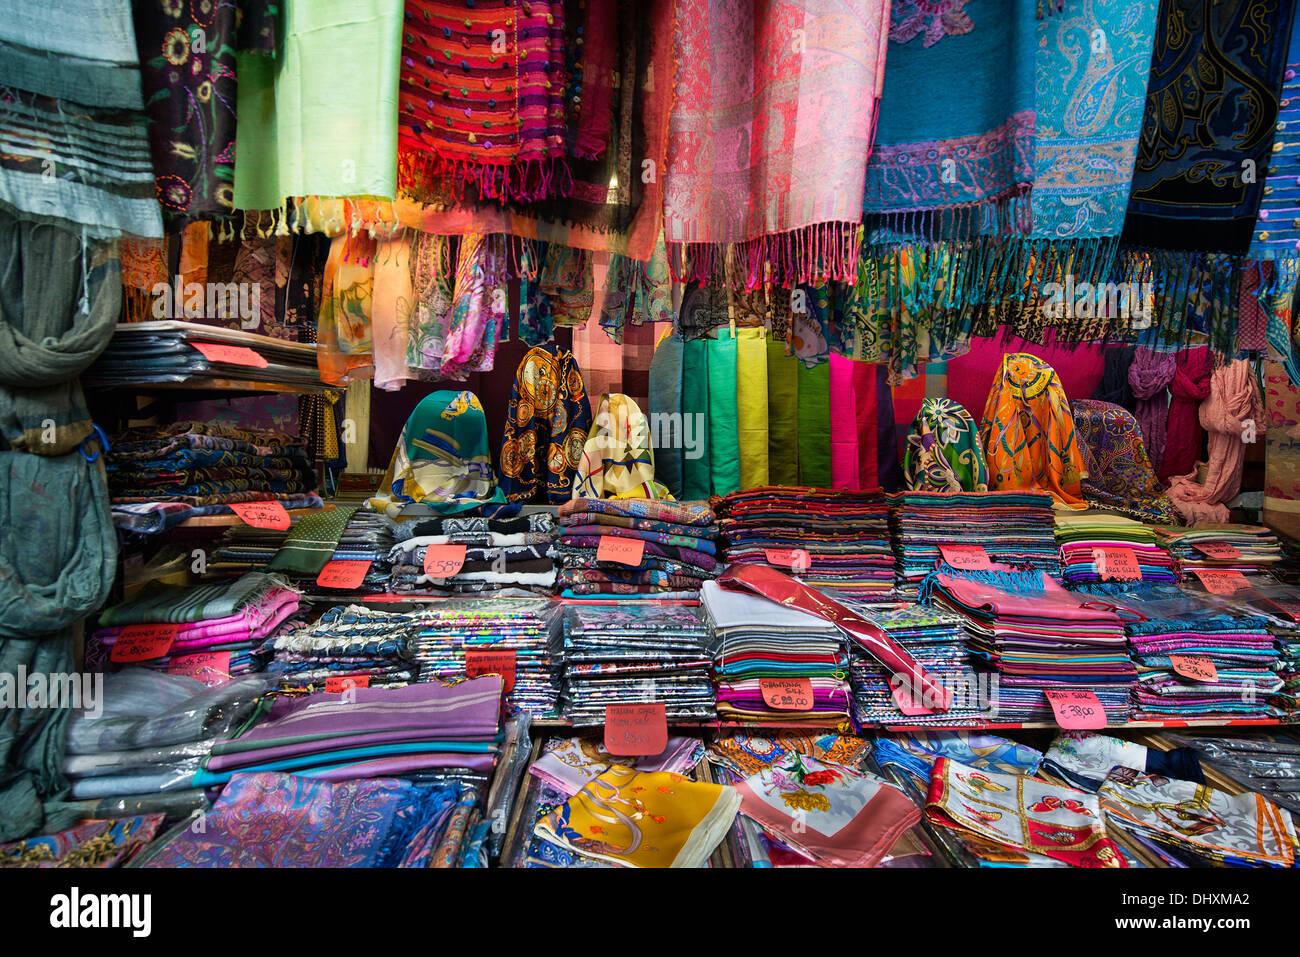 Italian silk goods shop in the Mercato Porcellino, Porcellino Market, Florence, Italy - Stock Image